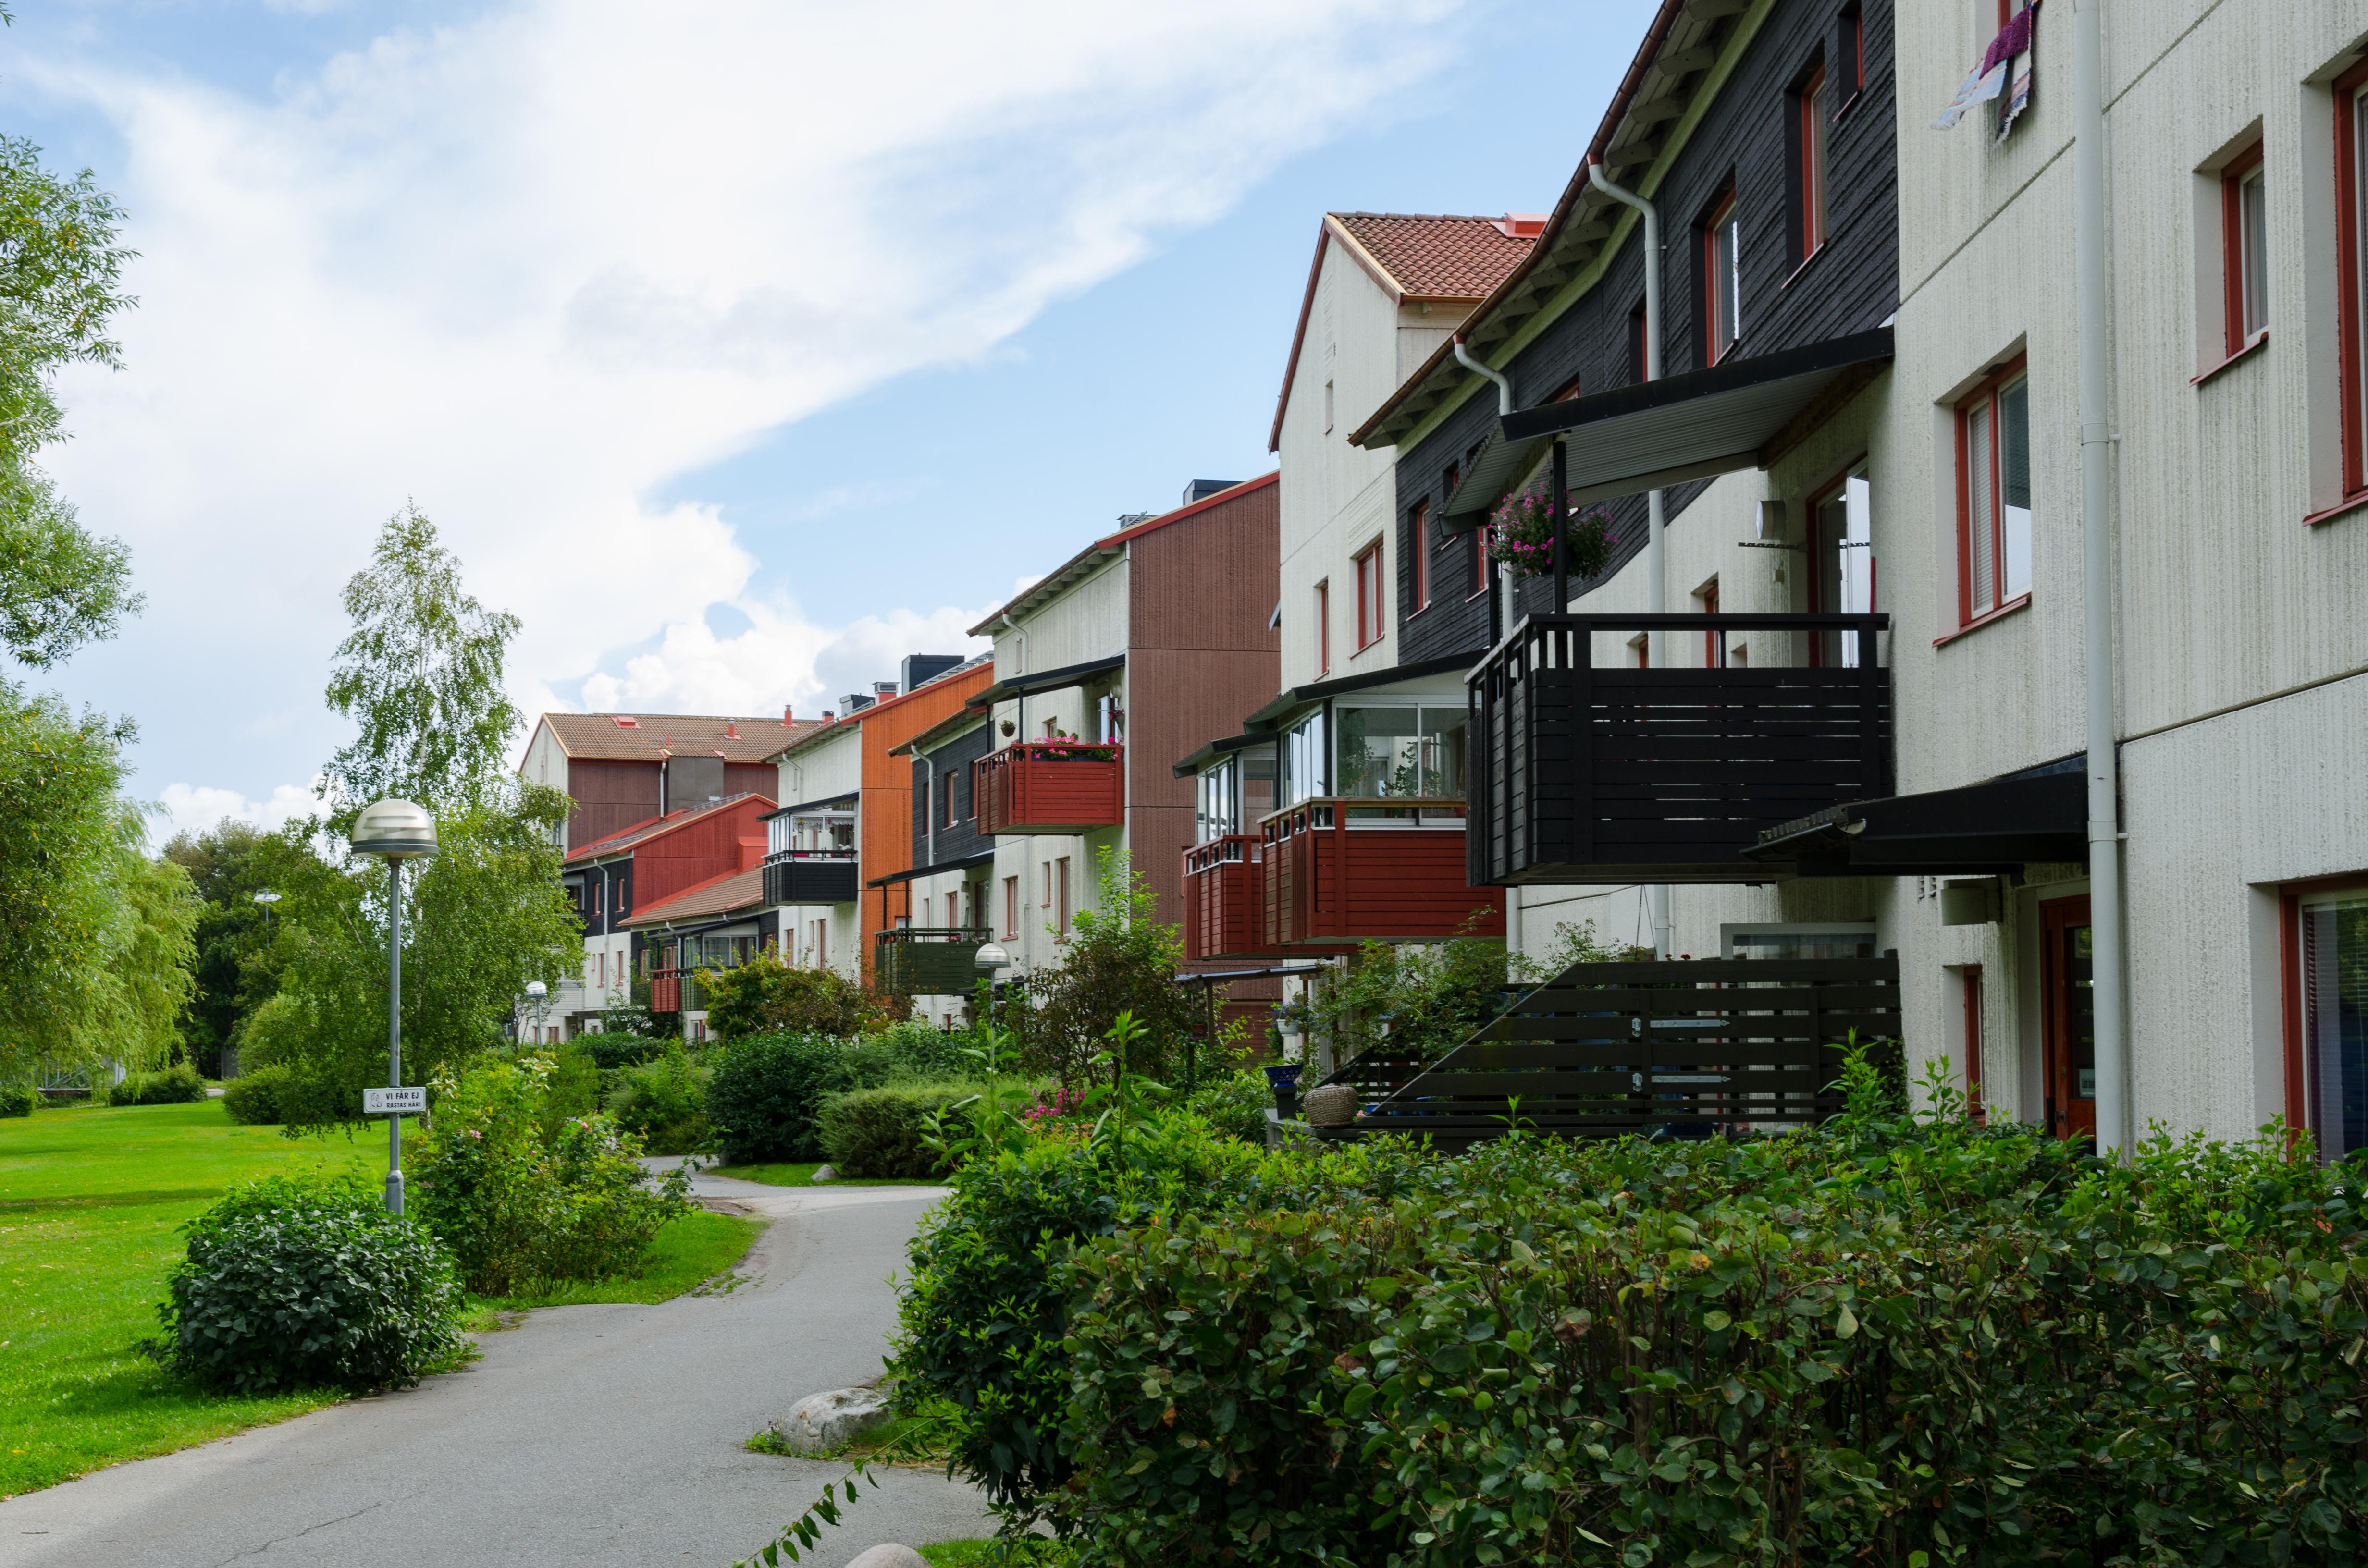 dating site ekerö götalunden dating site